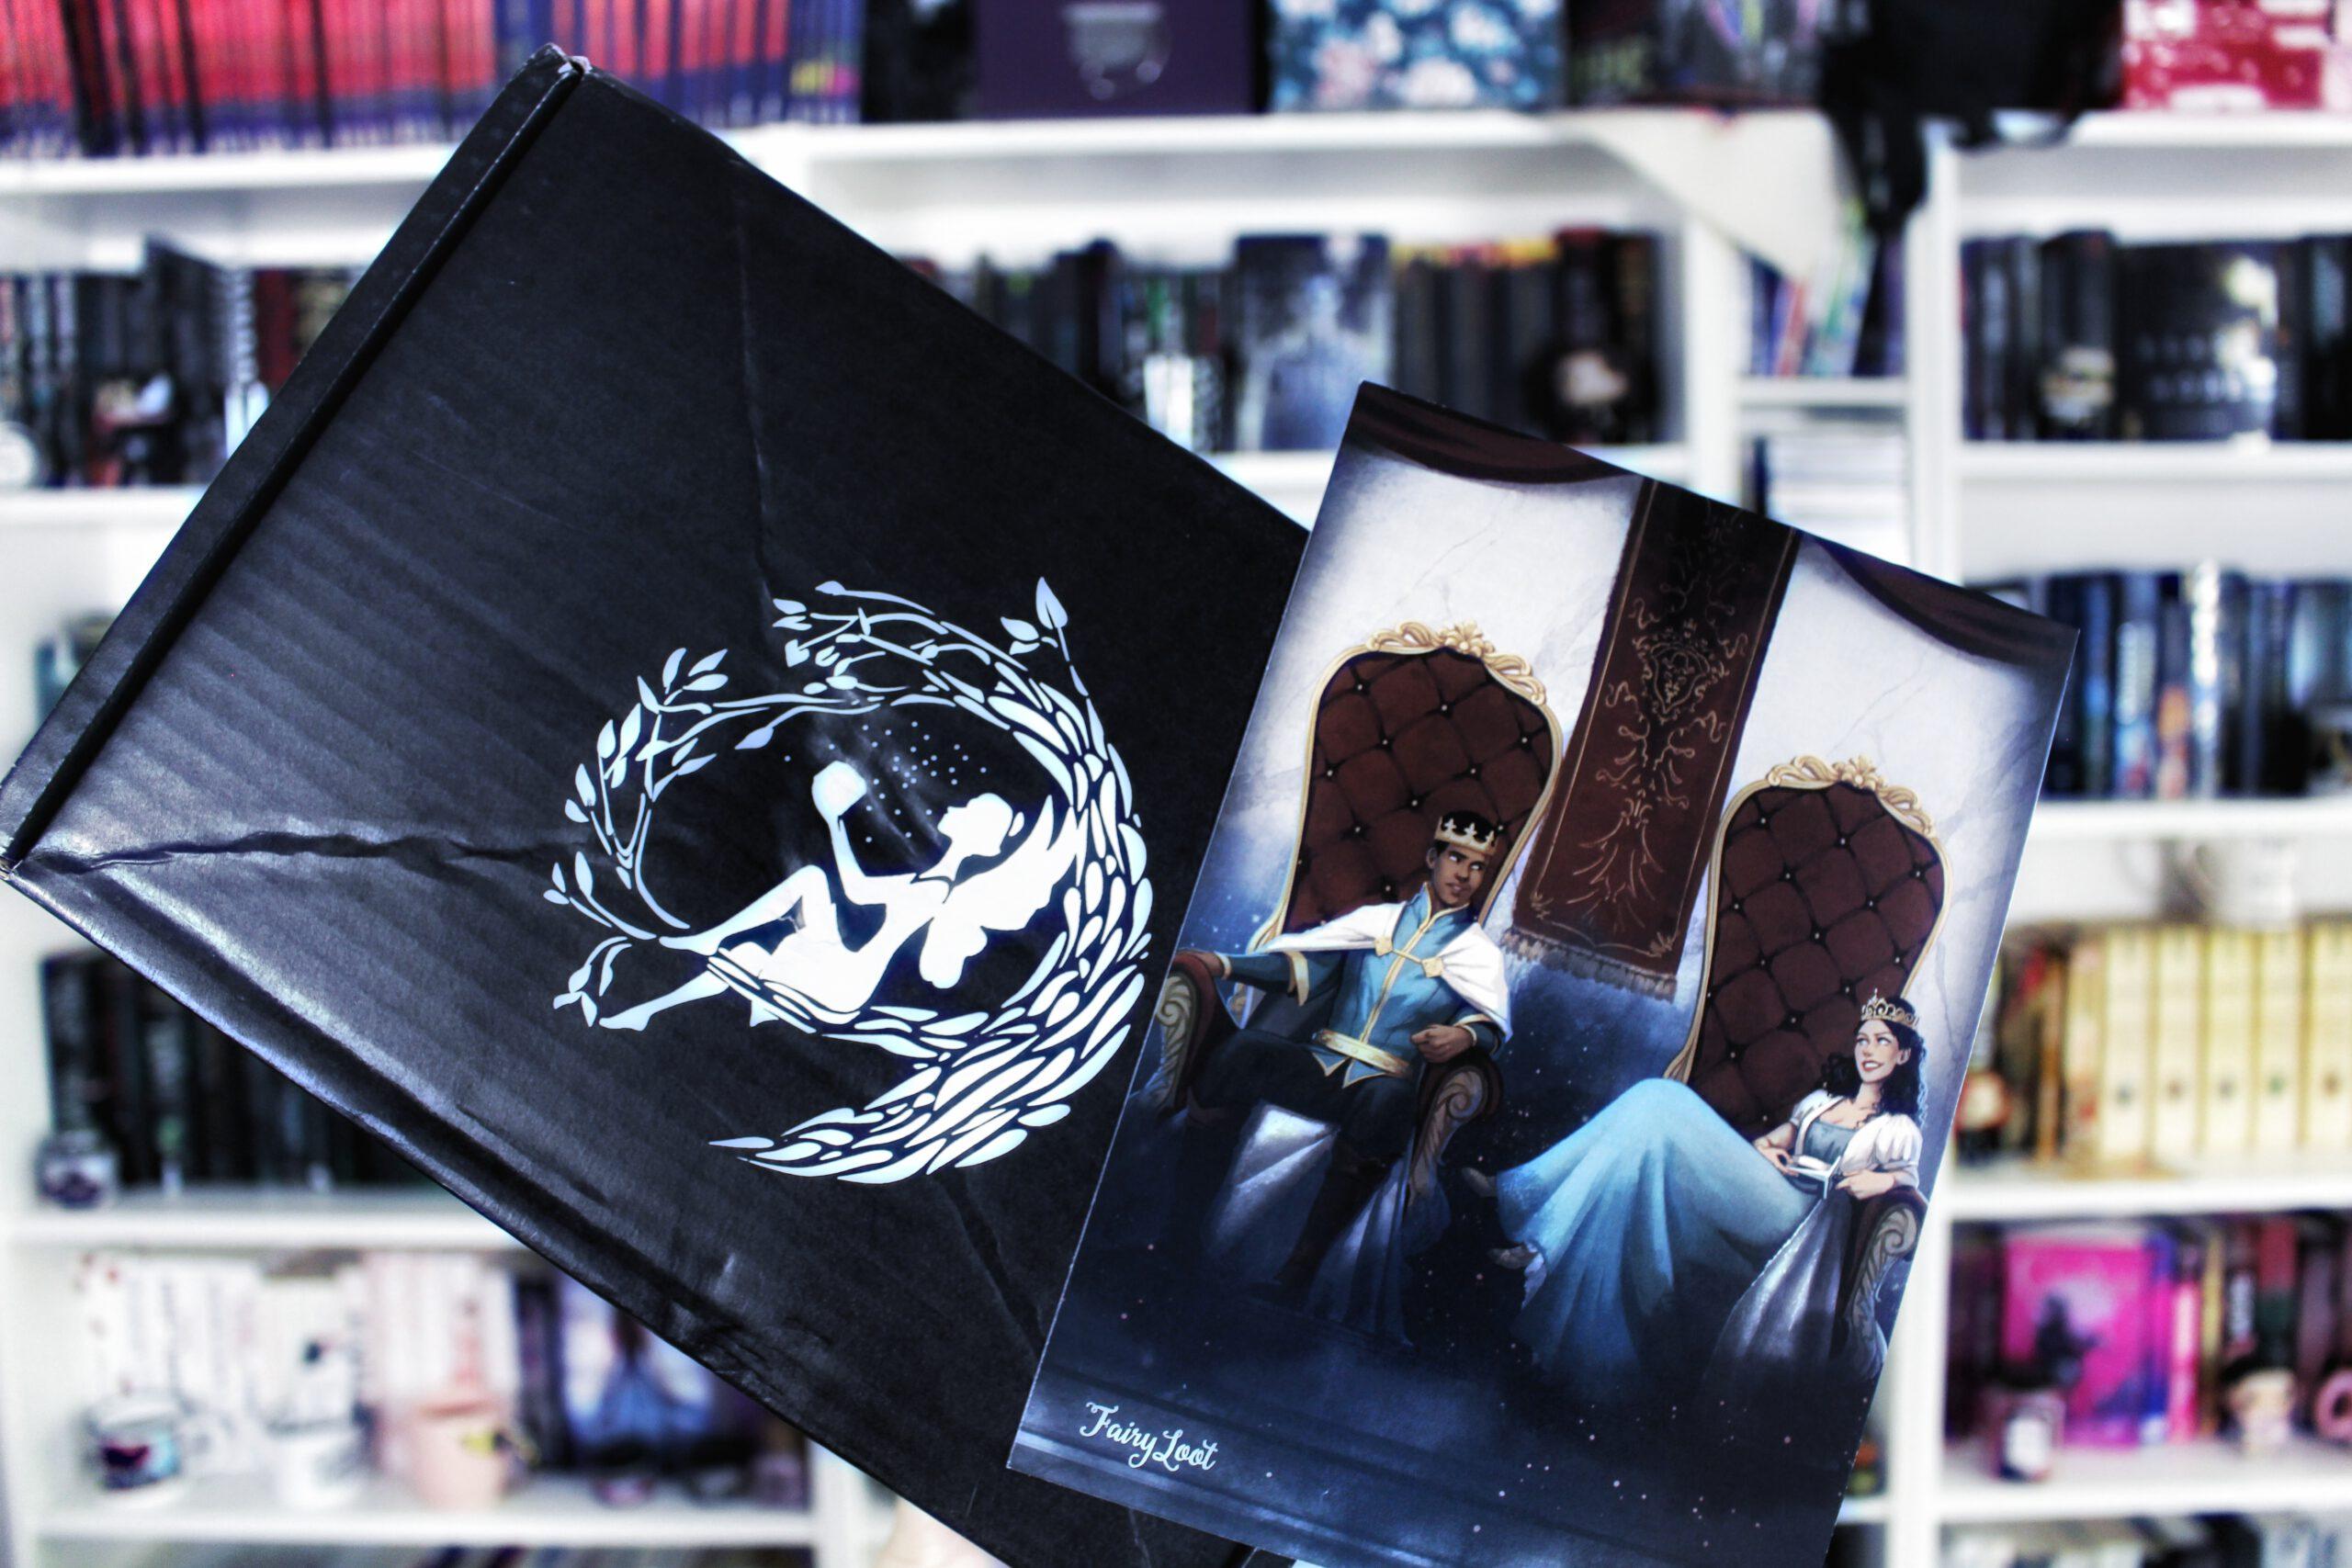 Unpacking | FairyLoot – Reilient Royals